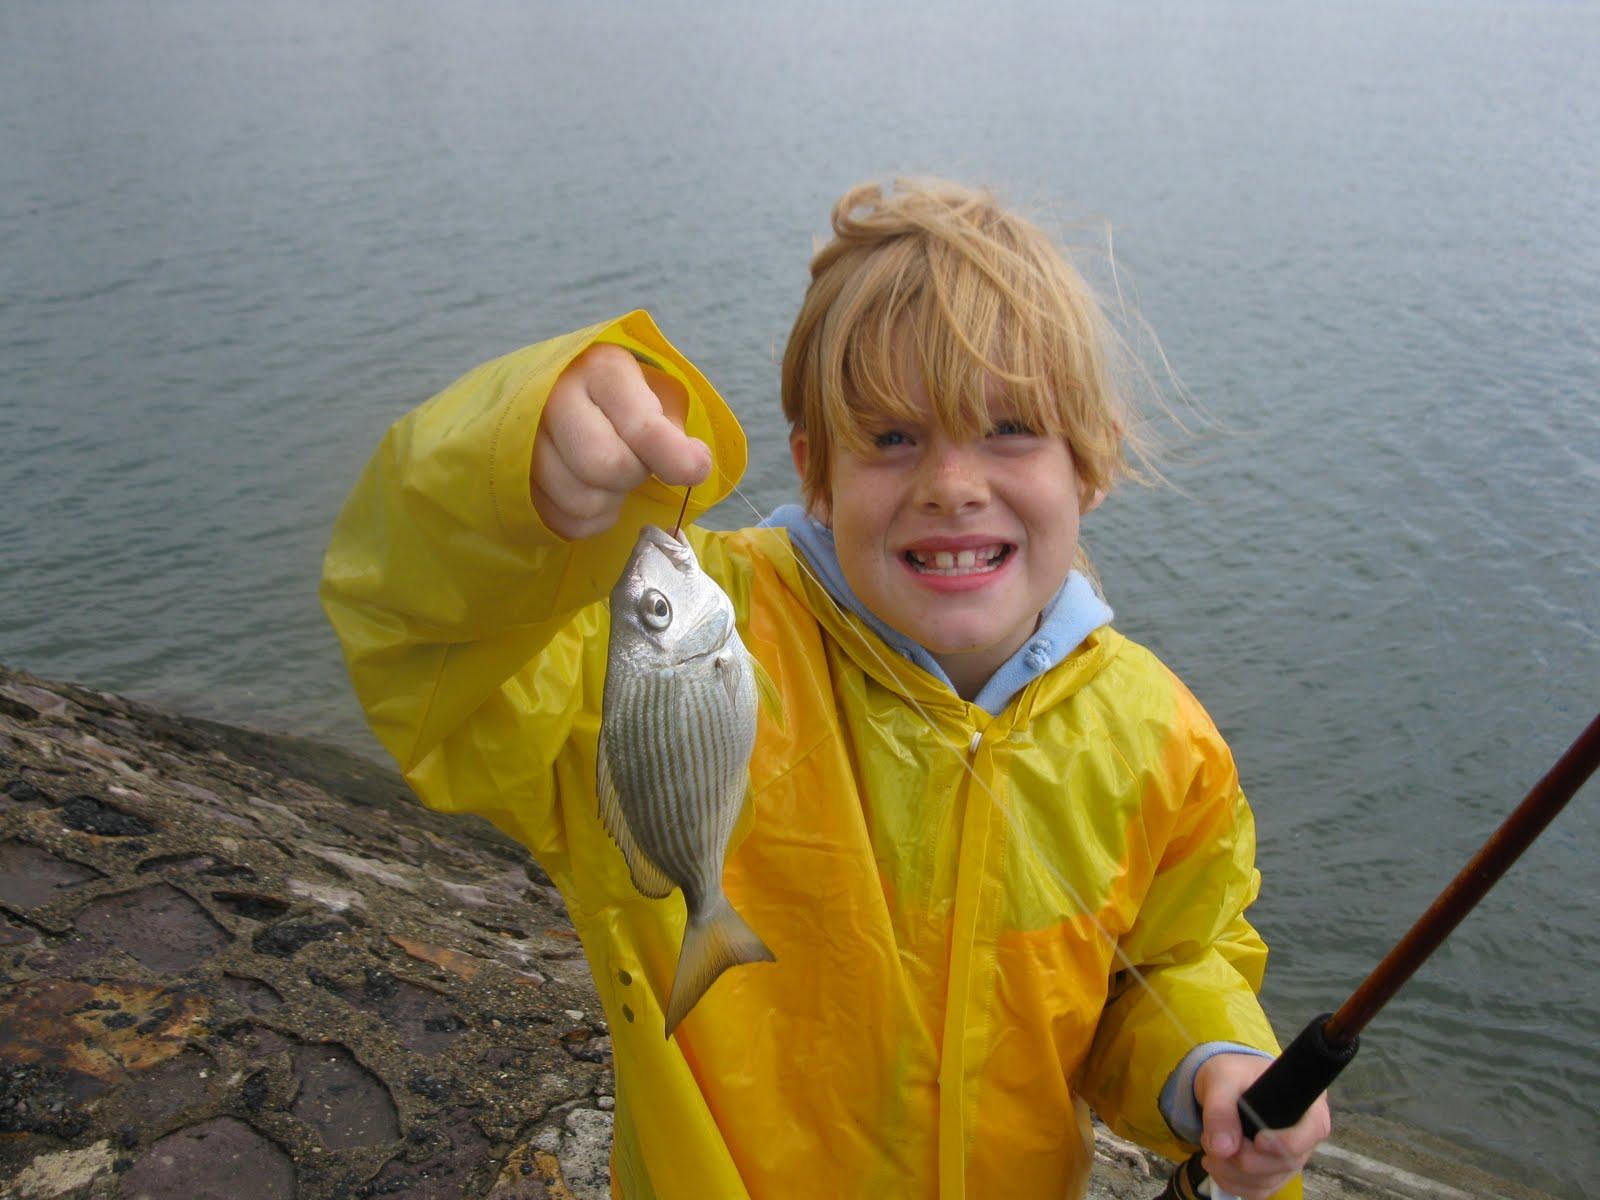 Take a kid fishing day 2011 take a kid fishing day 2011 for Take a kid fishing